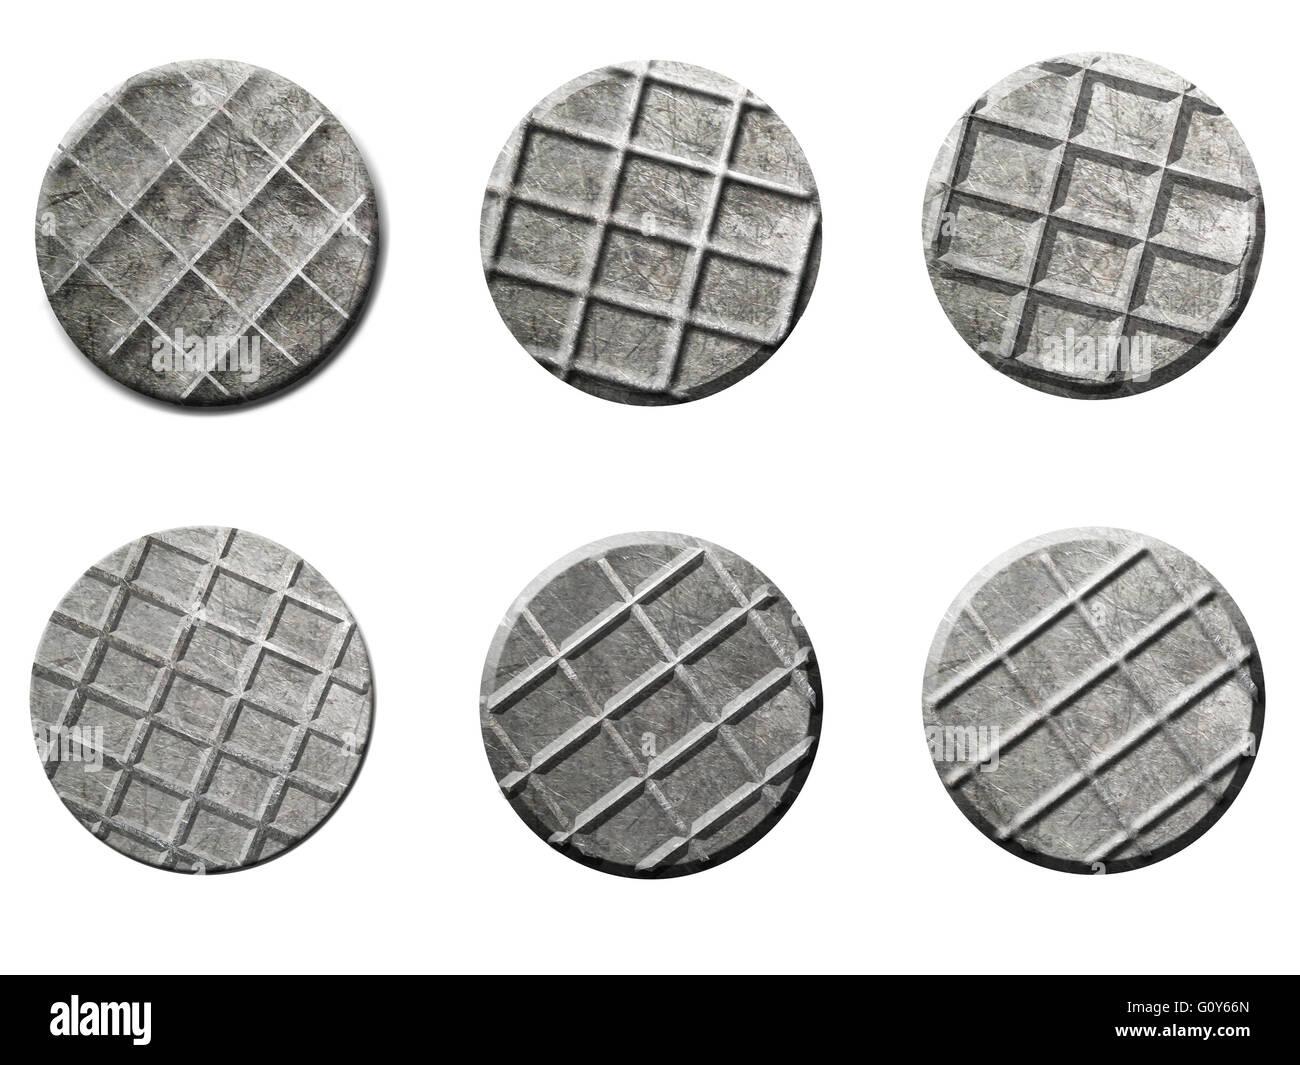 New iron nail heads on white background - Stock Image